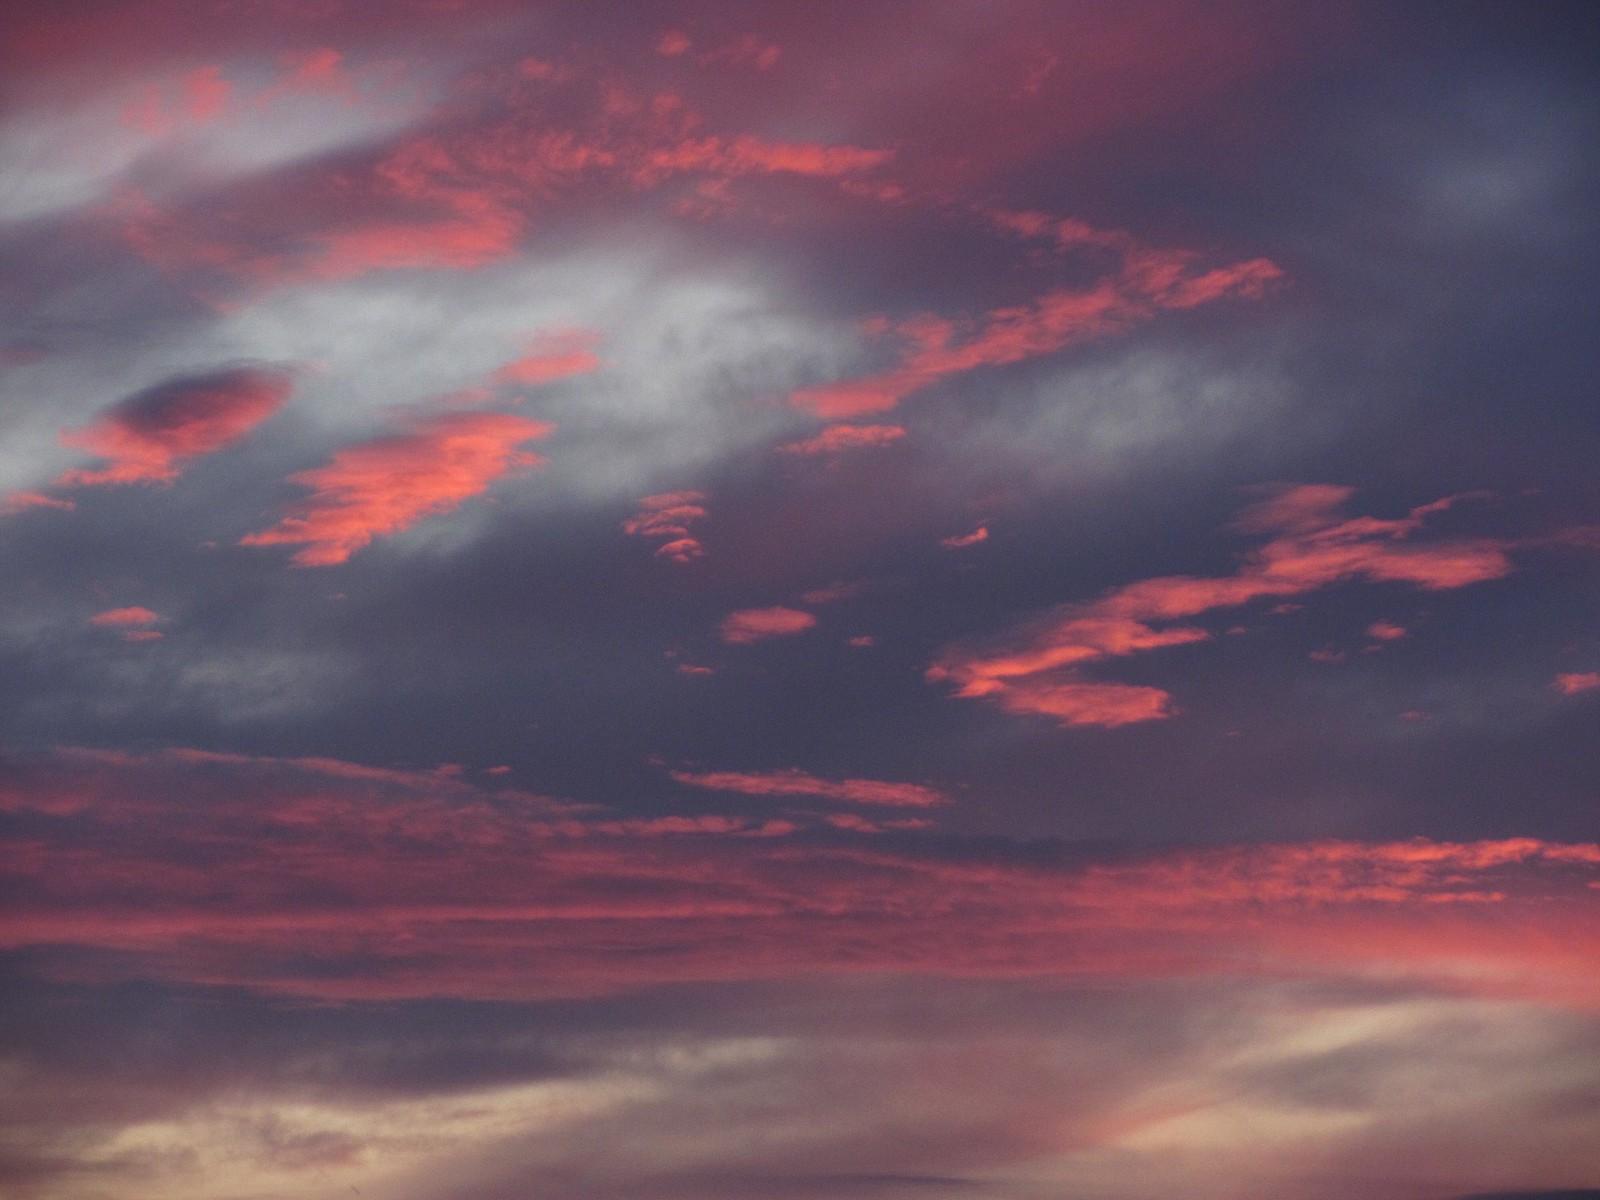 Pink sunset clouds against dark purple bakdrop